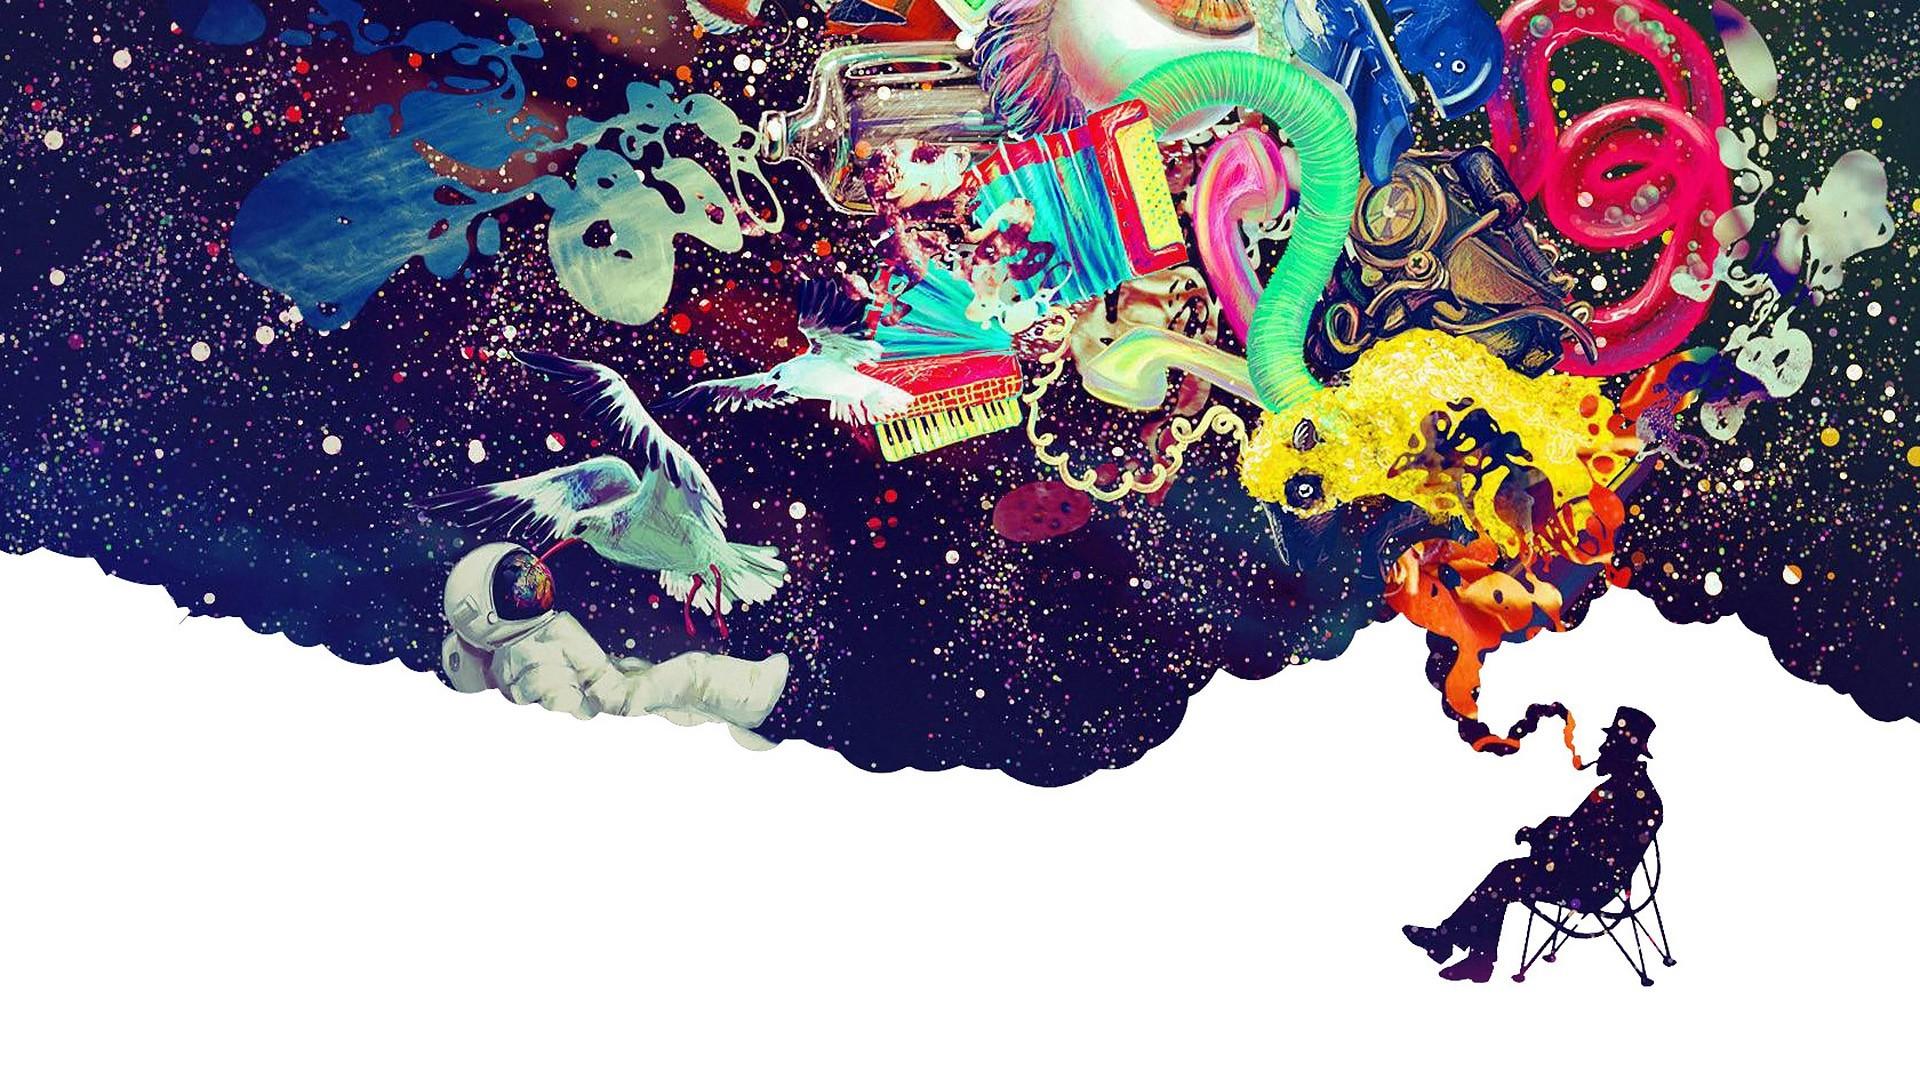 smoking smoke astronauts dreams colors upscaled – Wallpaper (#2890205) /  Wallbase.cc